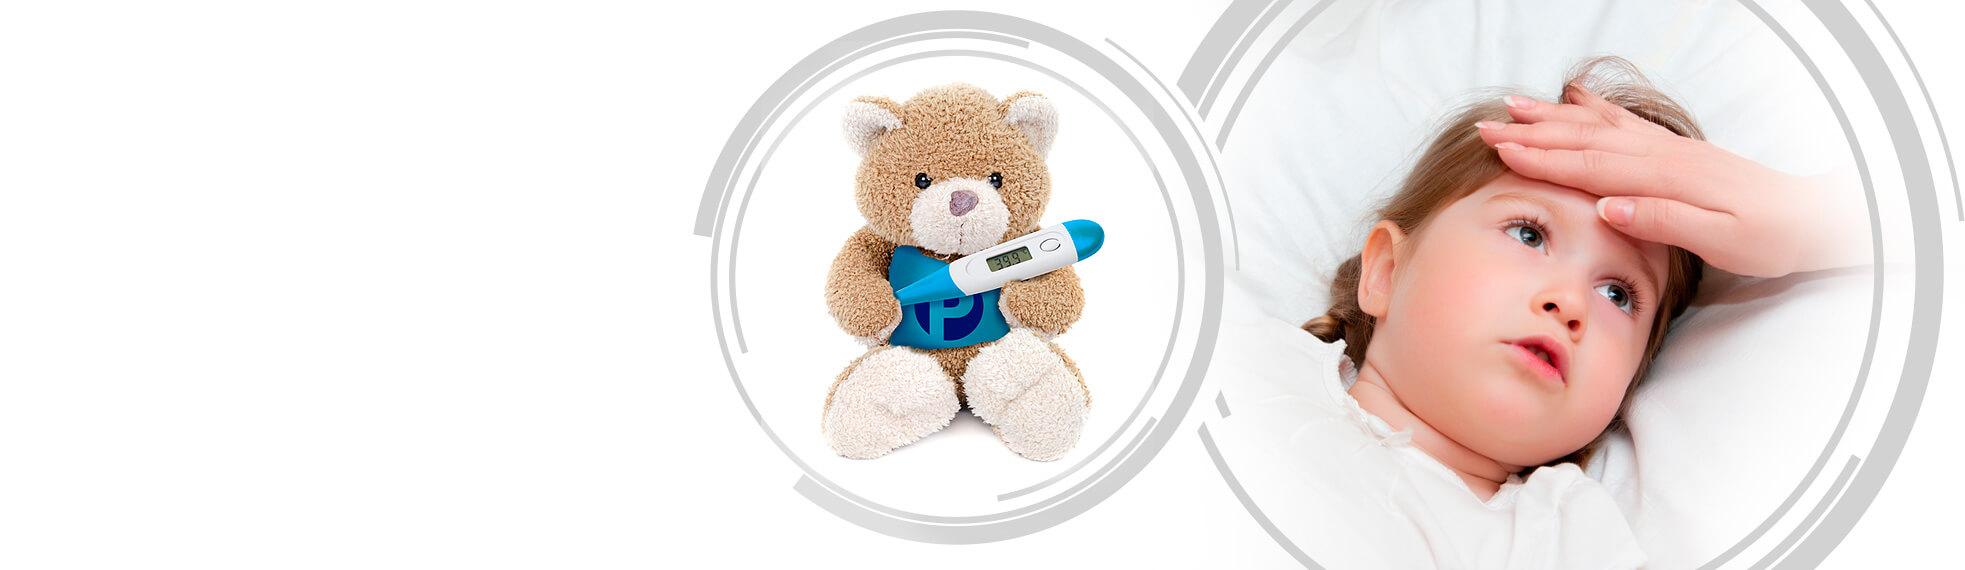 Как быстро сбить температуру у ребенка